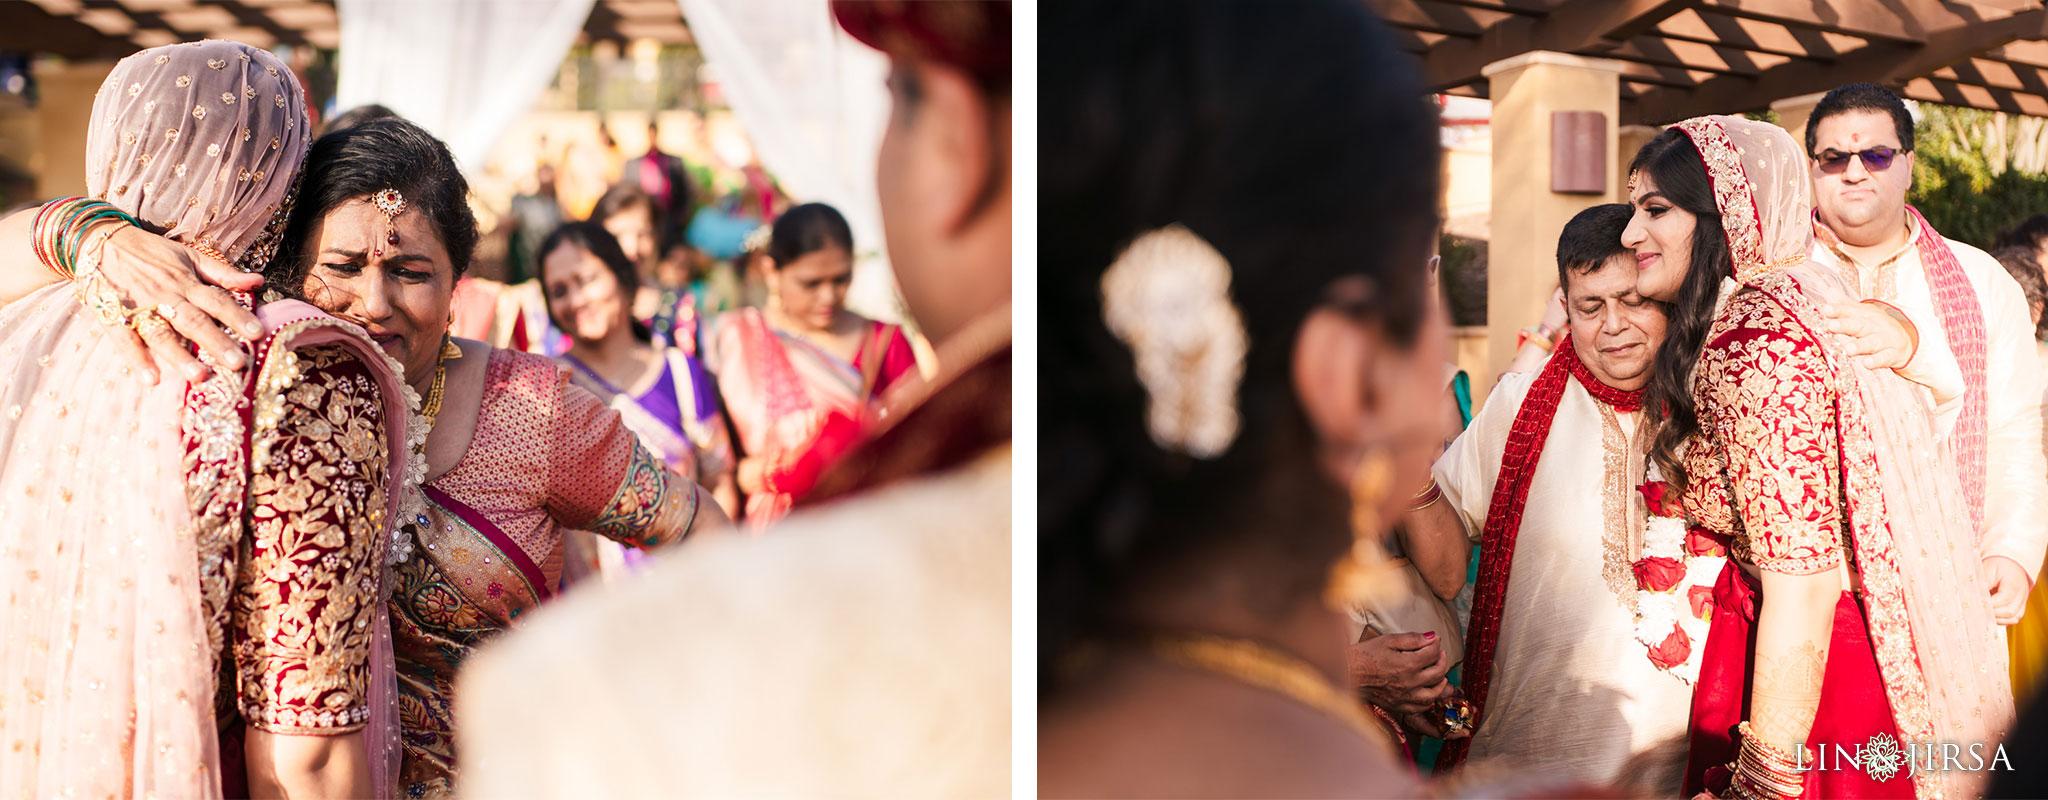 33 sheraton carlsbad resort indian wedding photography